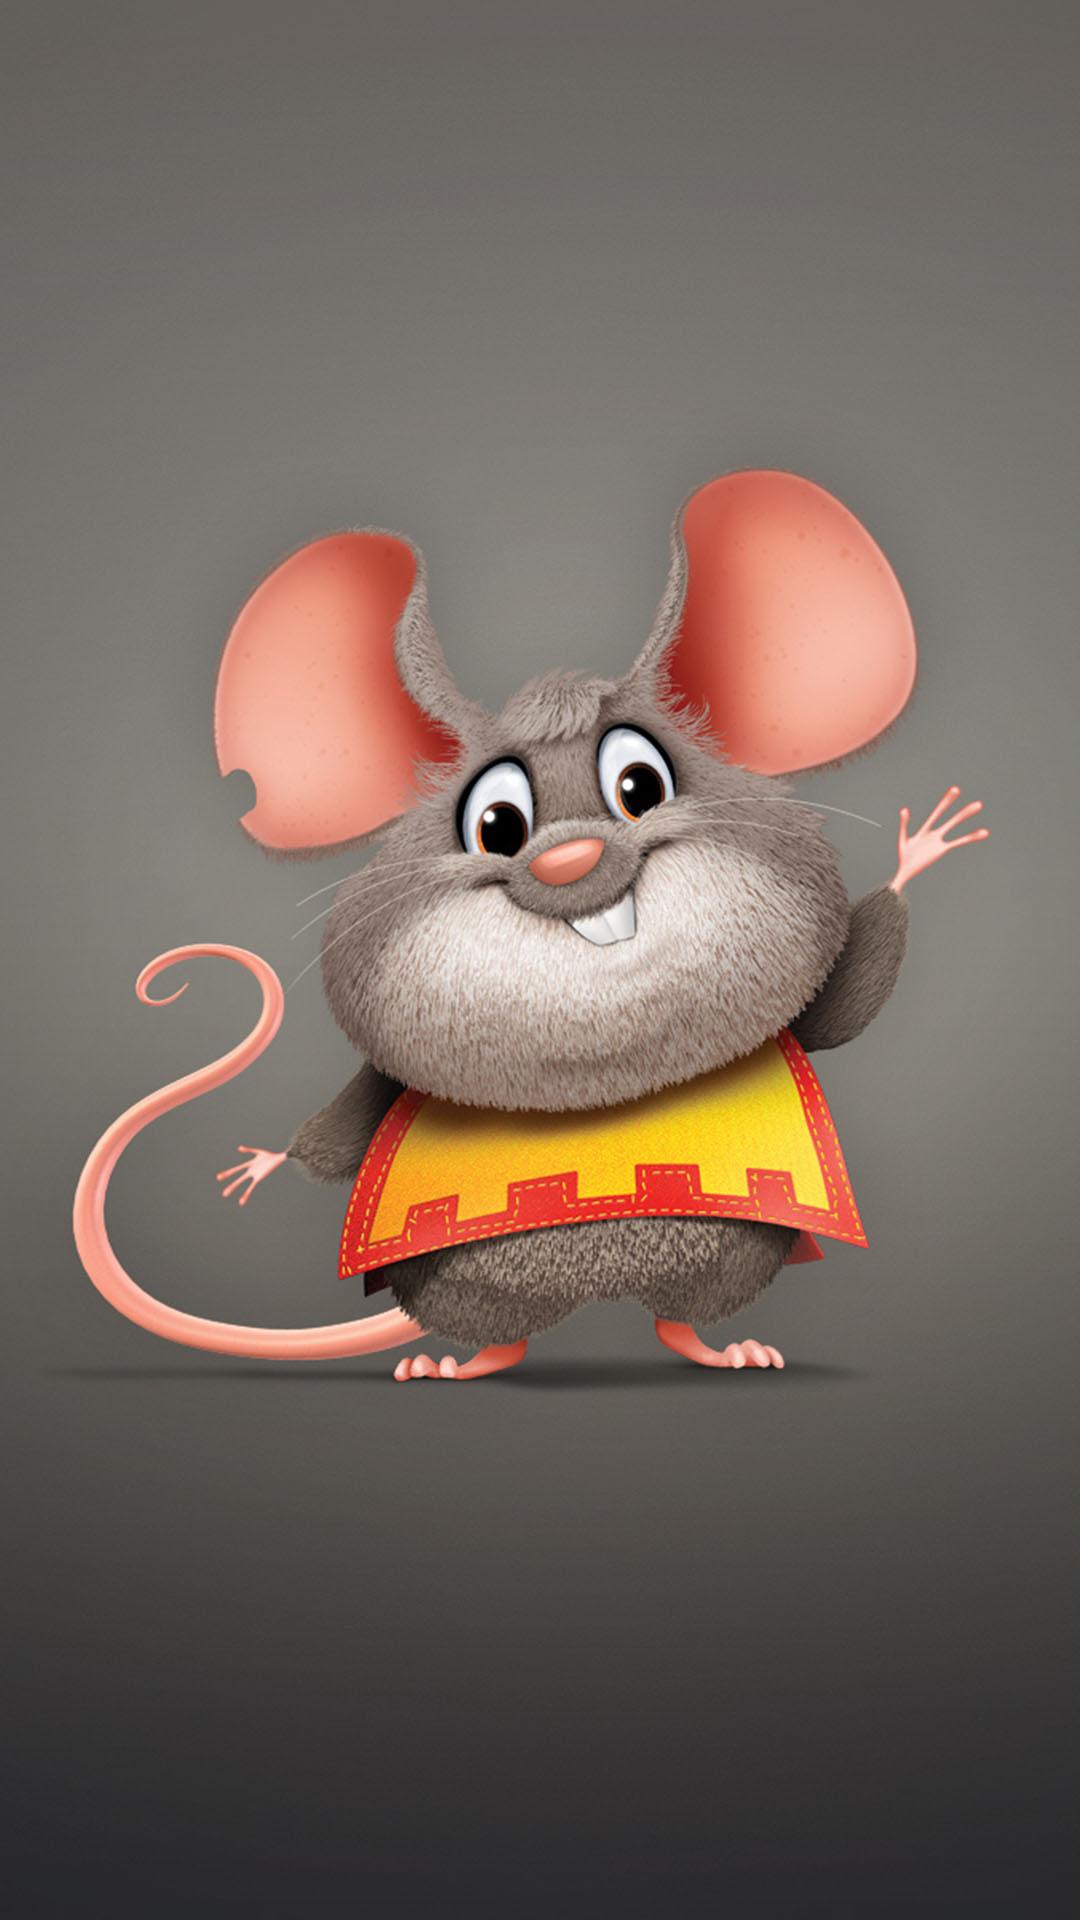 art mouse happy 1080x1920